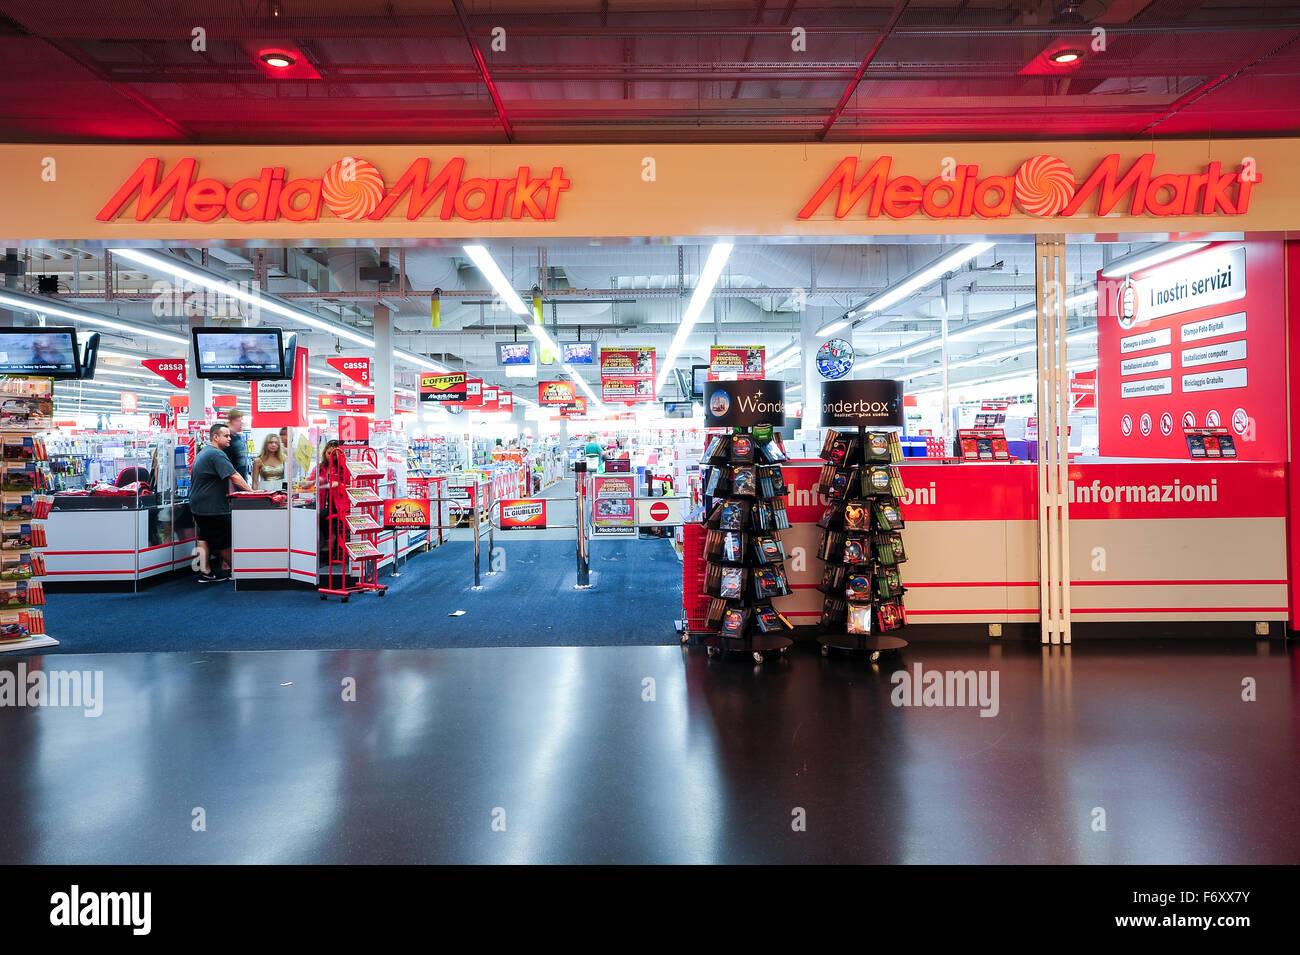 Electronics Shop Supermarket Store Stock Photos & Electronics Shop ...